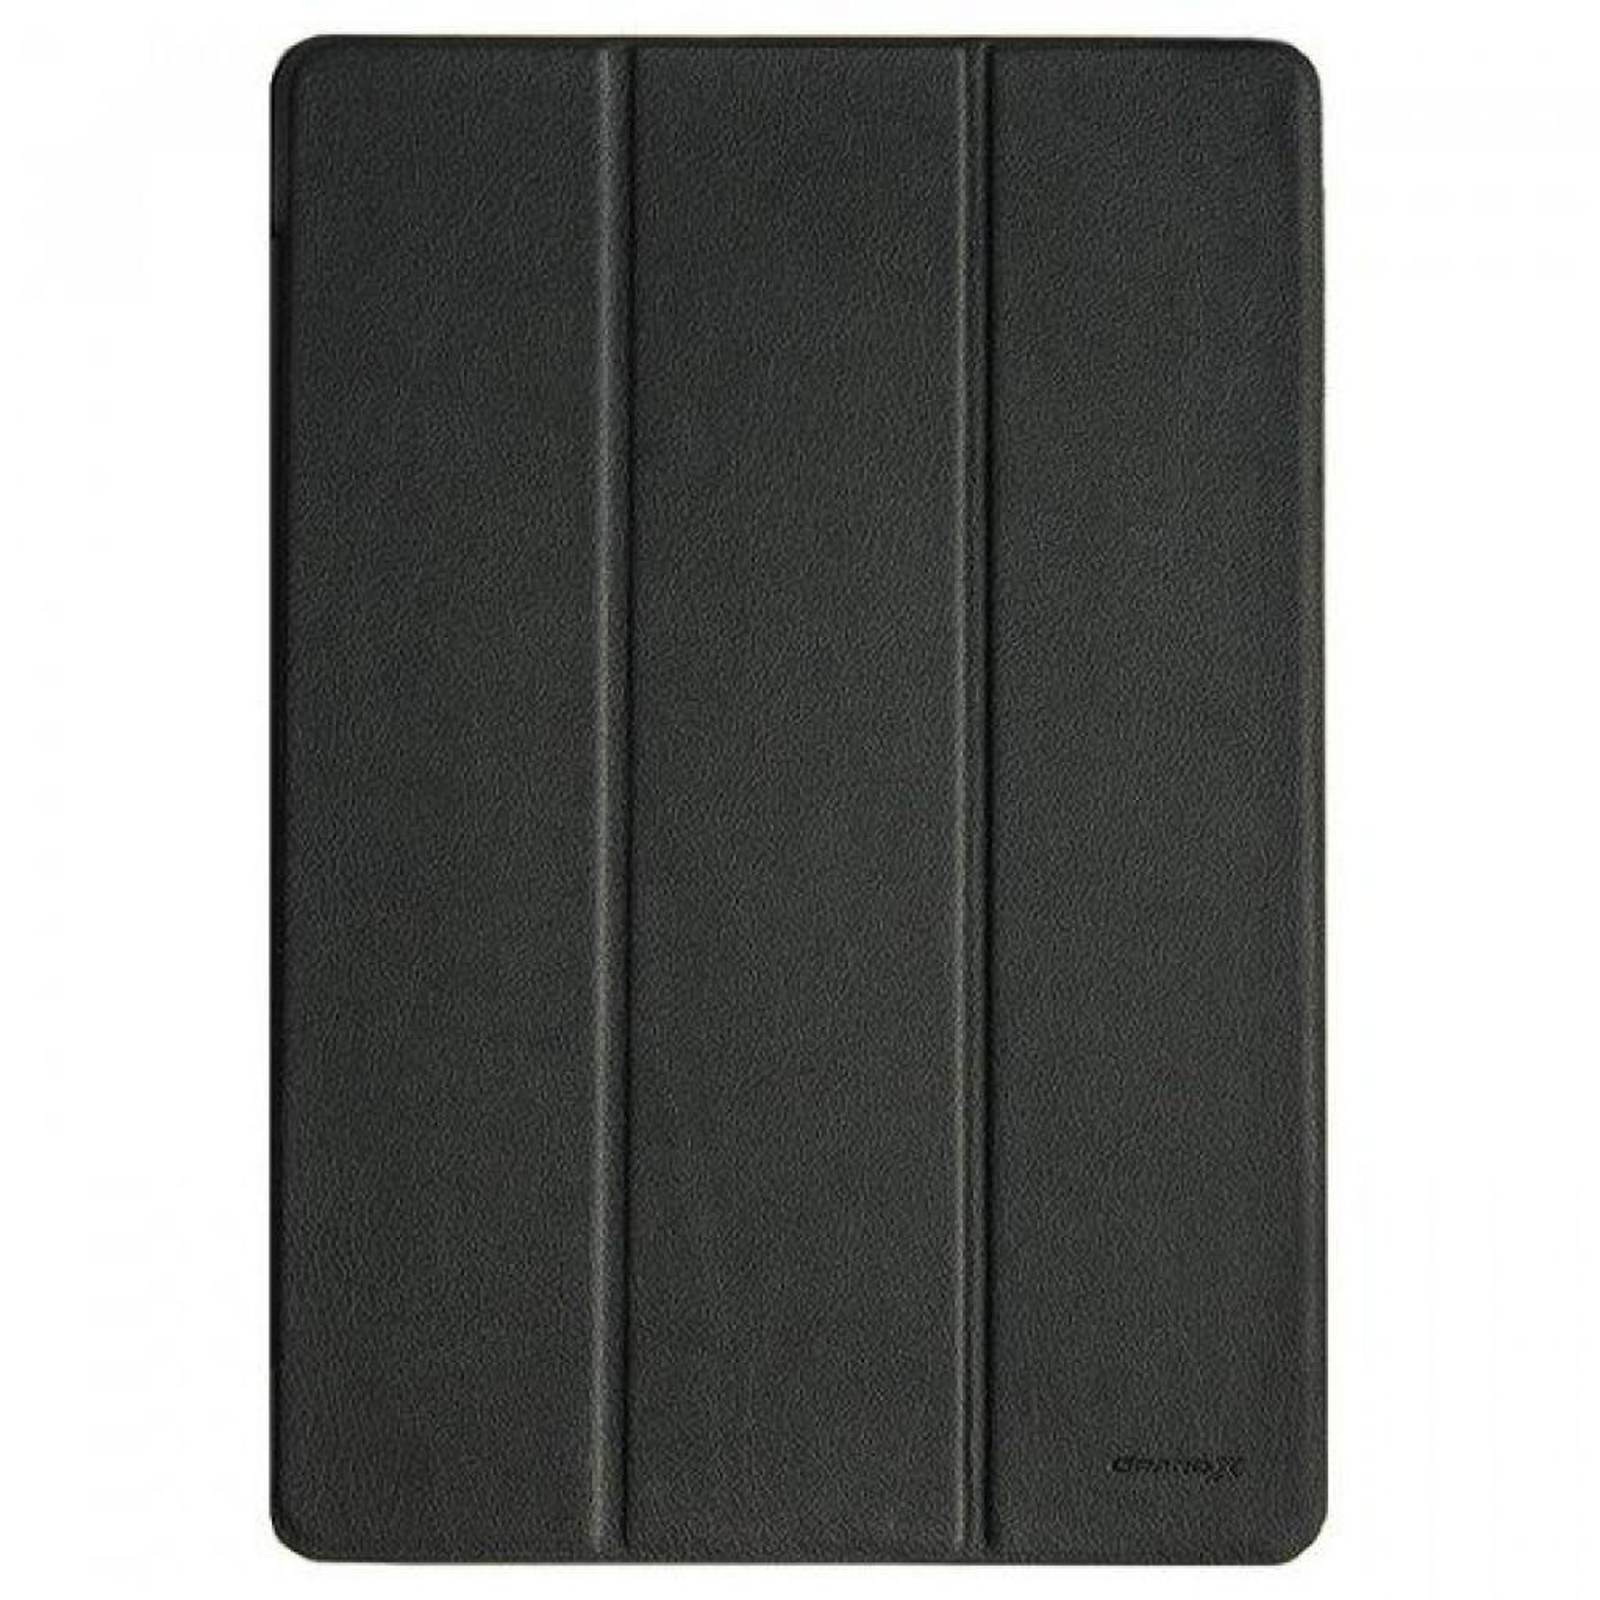 Чехол для планшета Grand-X для Huawei T3-10 Black (HTC-HT310B)